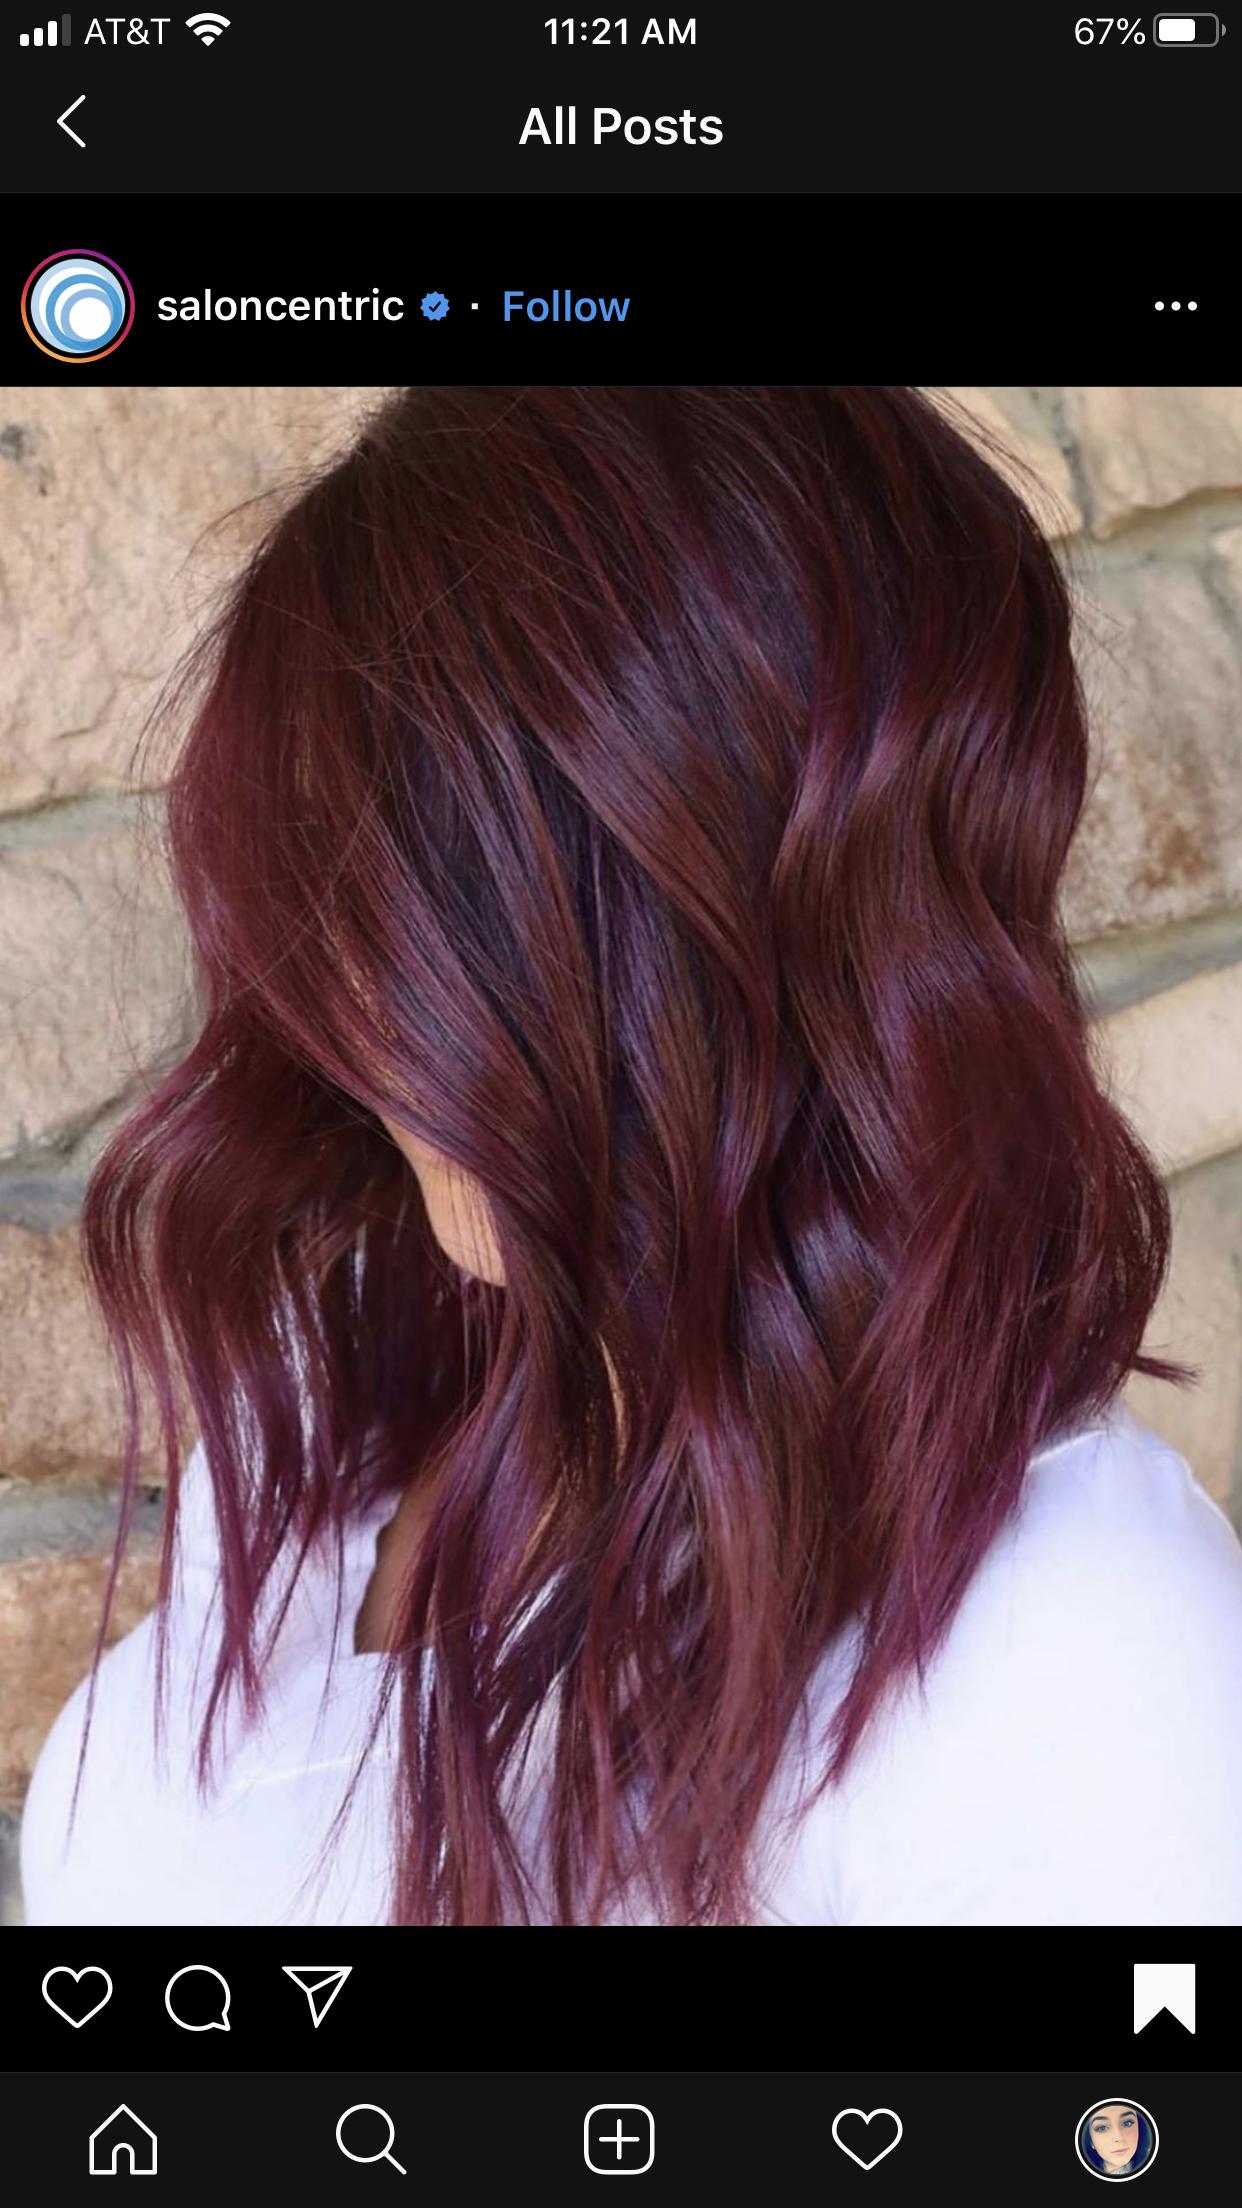 Photo of Corte de pelo vibrante del globo rojo